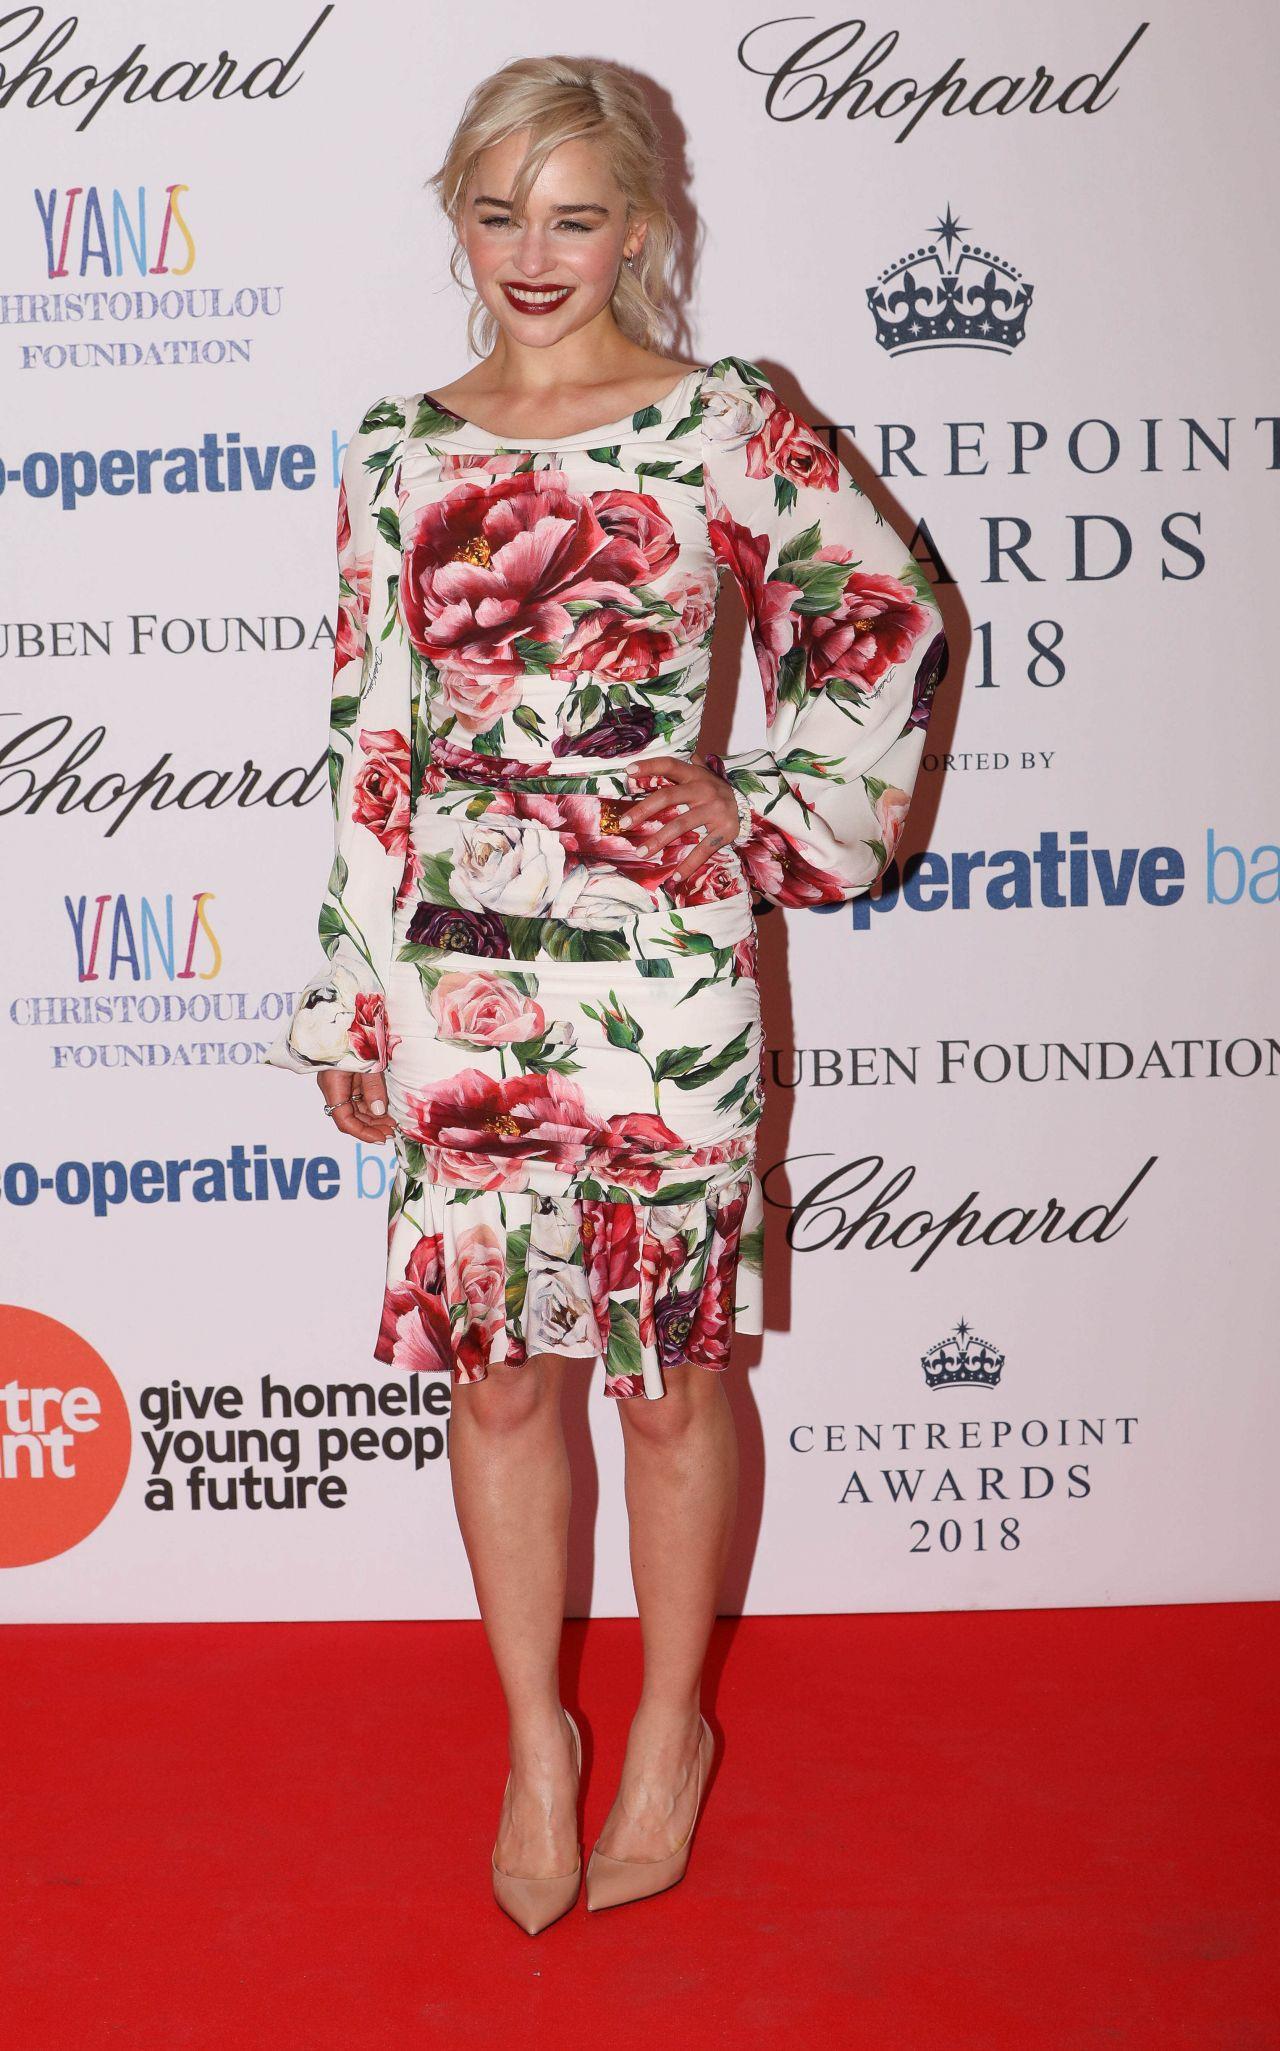 http://celebmafia.com/wp-content/uploads/2018/02/emilia-clarke-2018-centrepoint-awards-in-london-1.jpg